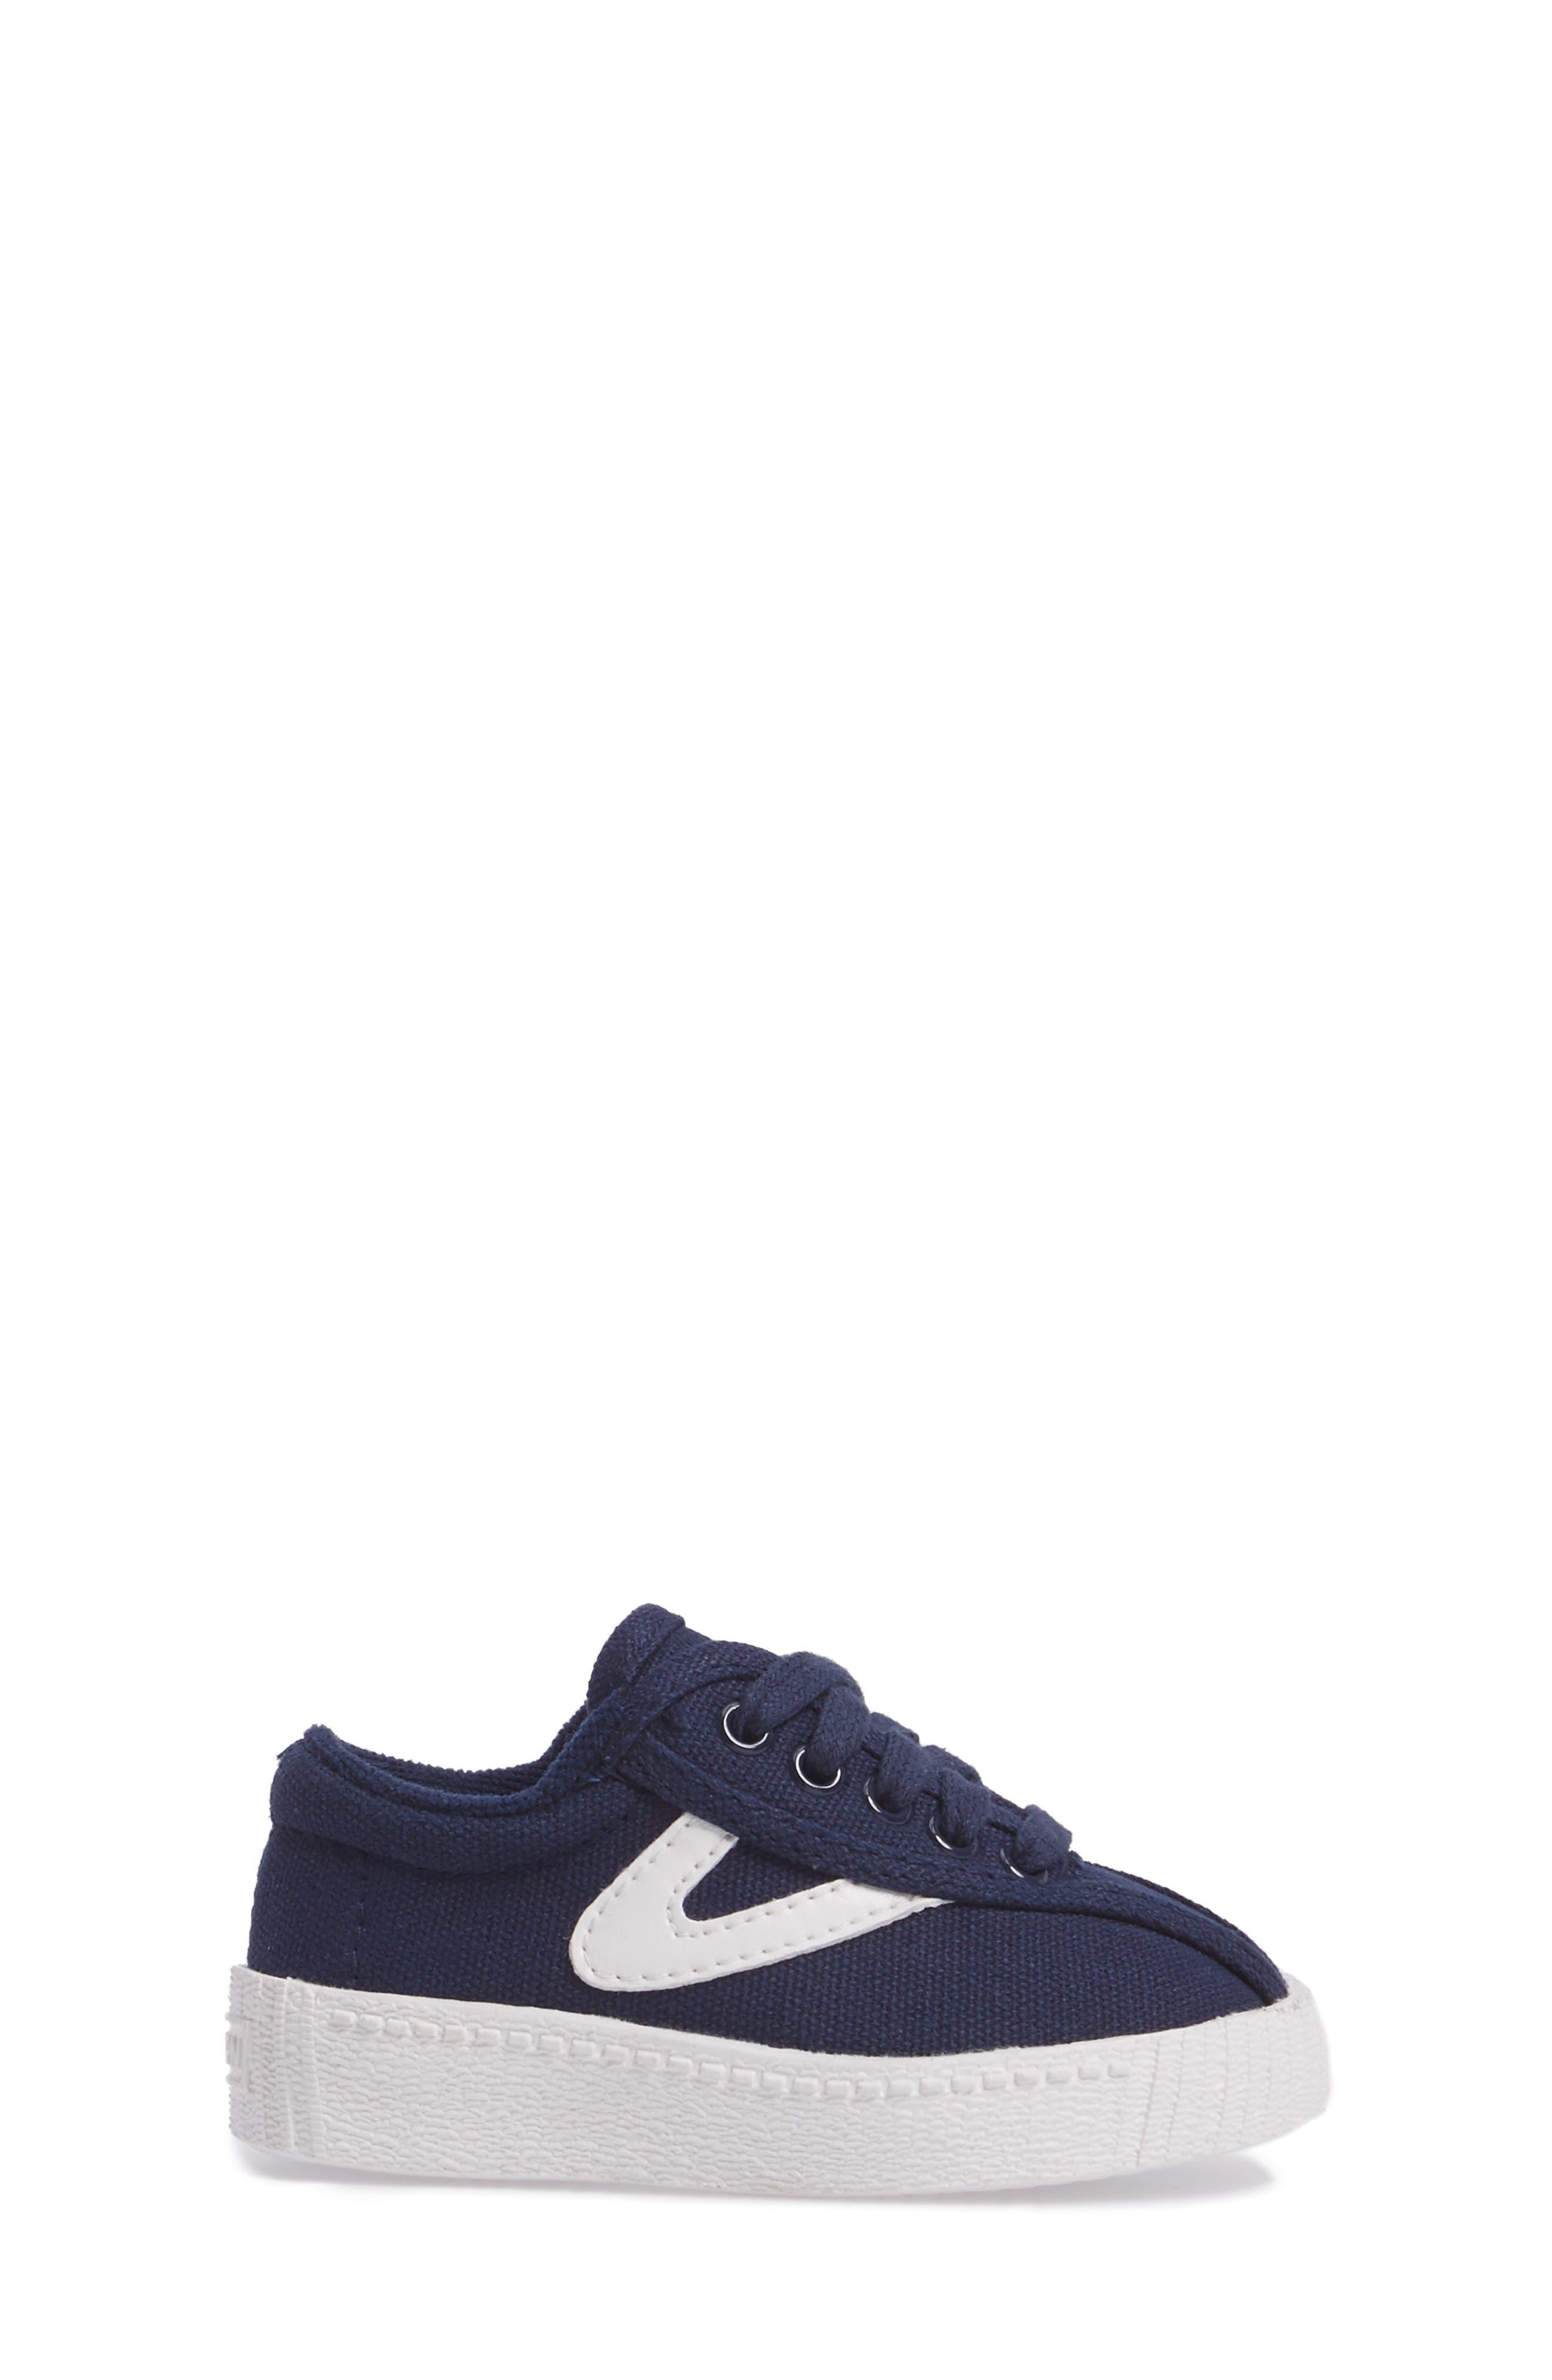 Nylite Plus Sneaker,                             Alternate thumbnail 9, color,